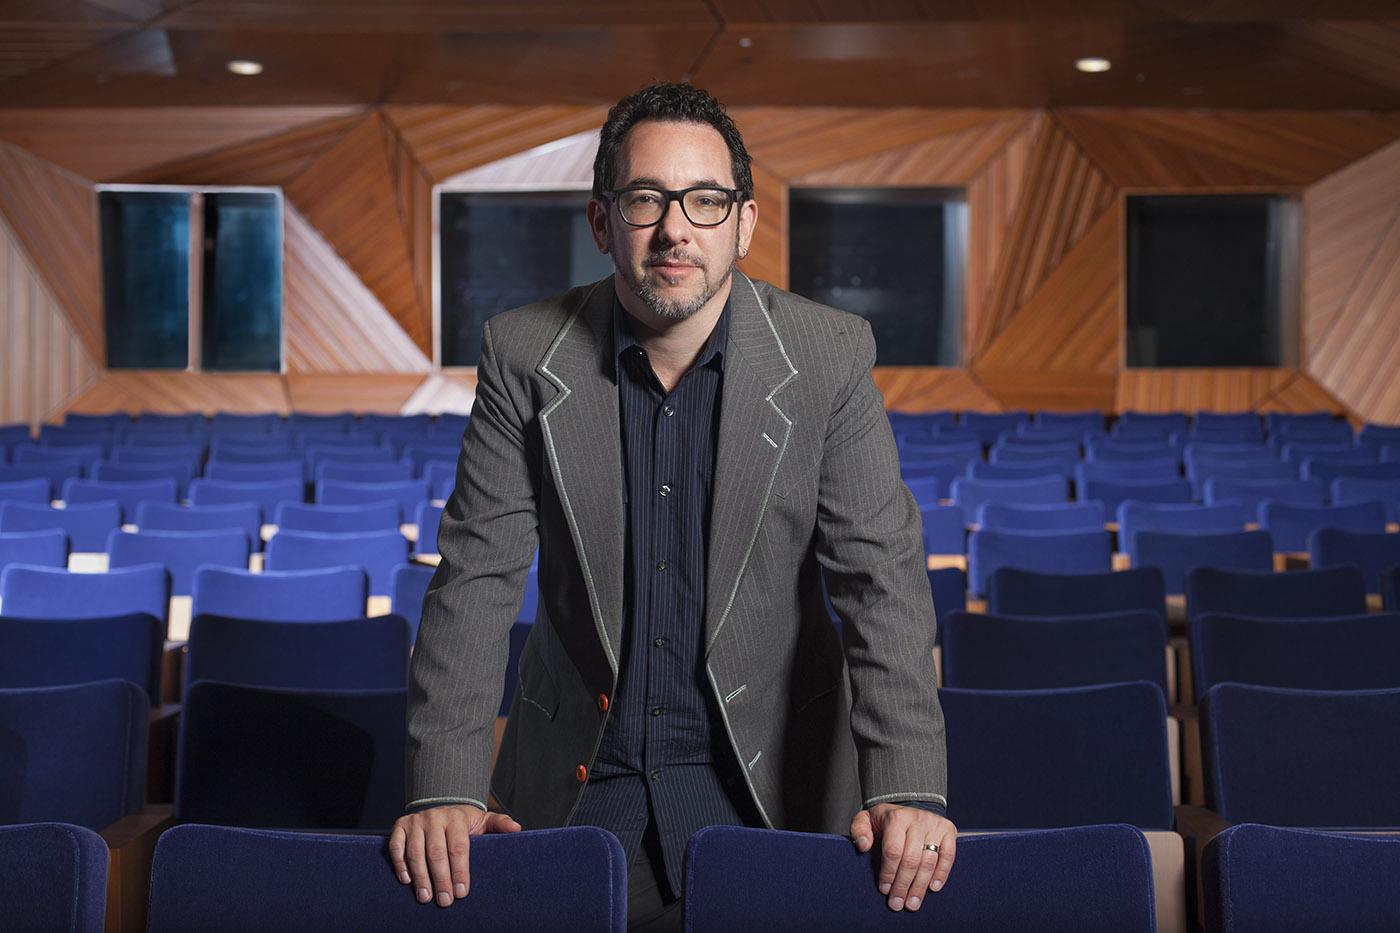 Artist Director in theatre